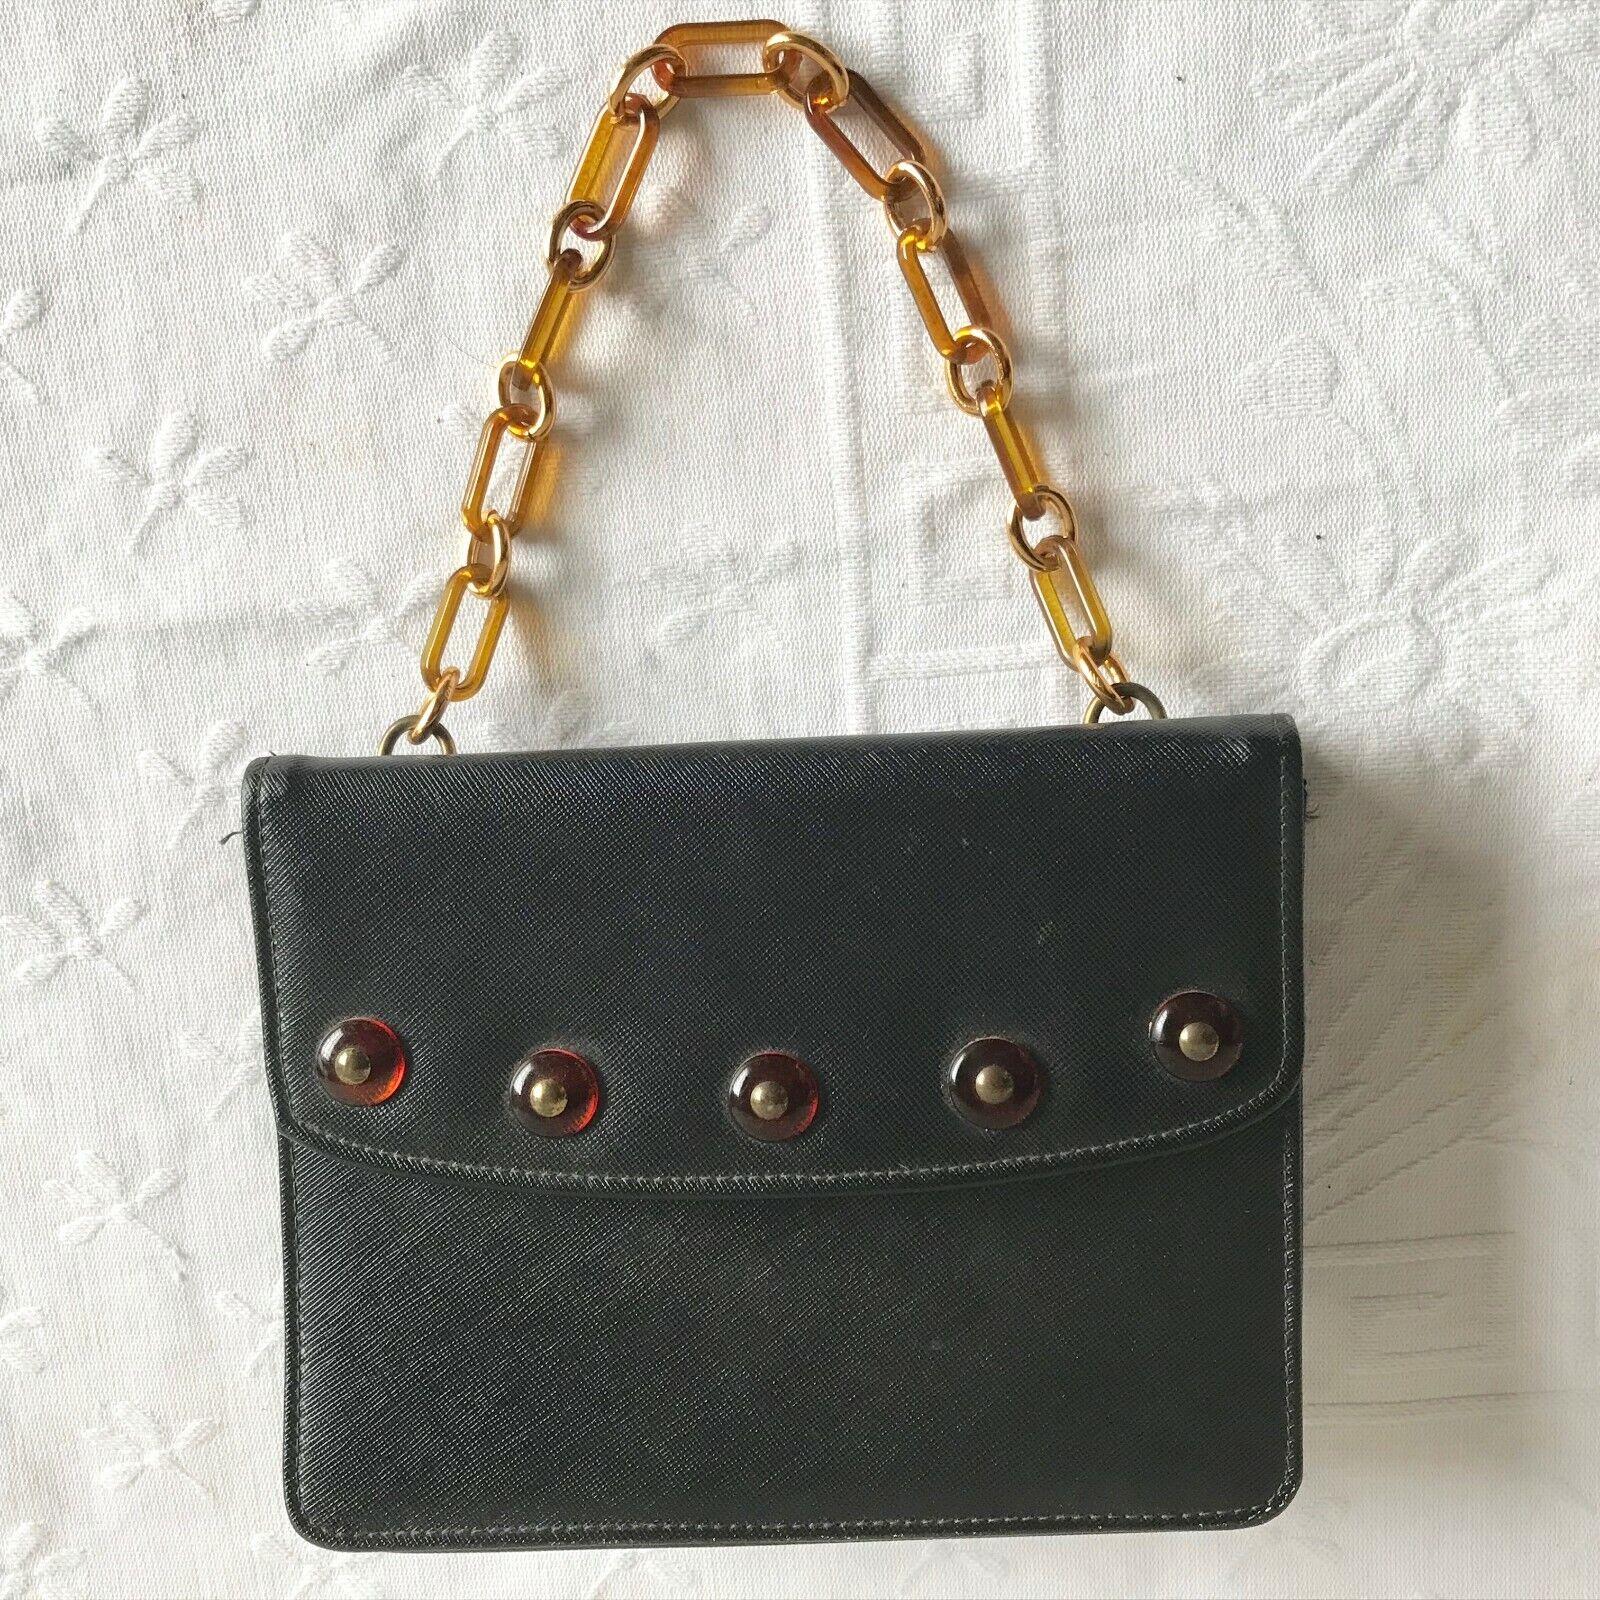 Vintage 1960s Black Faux Leather Delicato by Markay Mod Handbag Purse